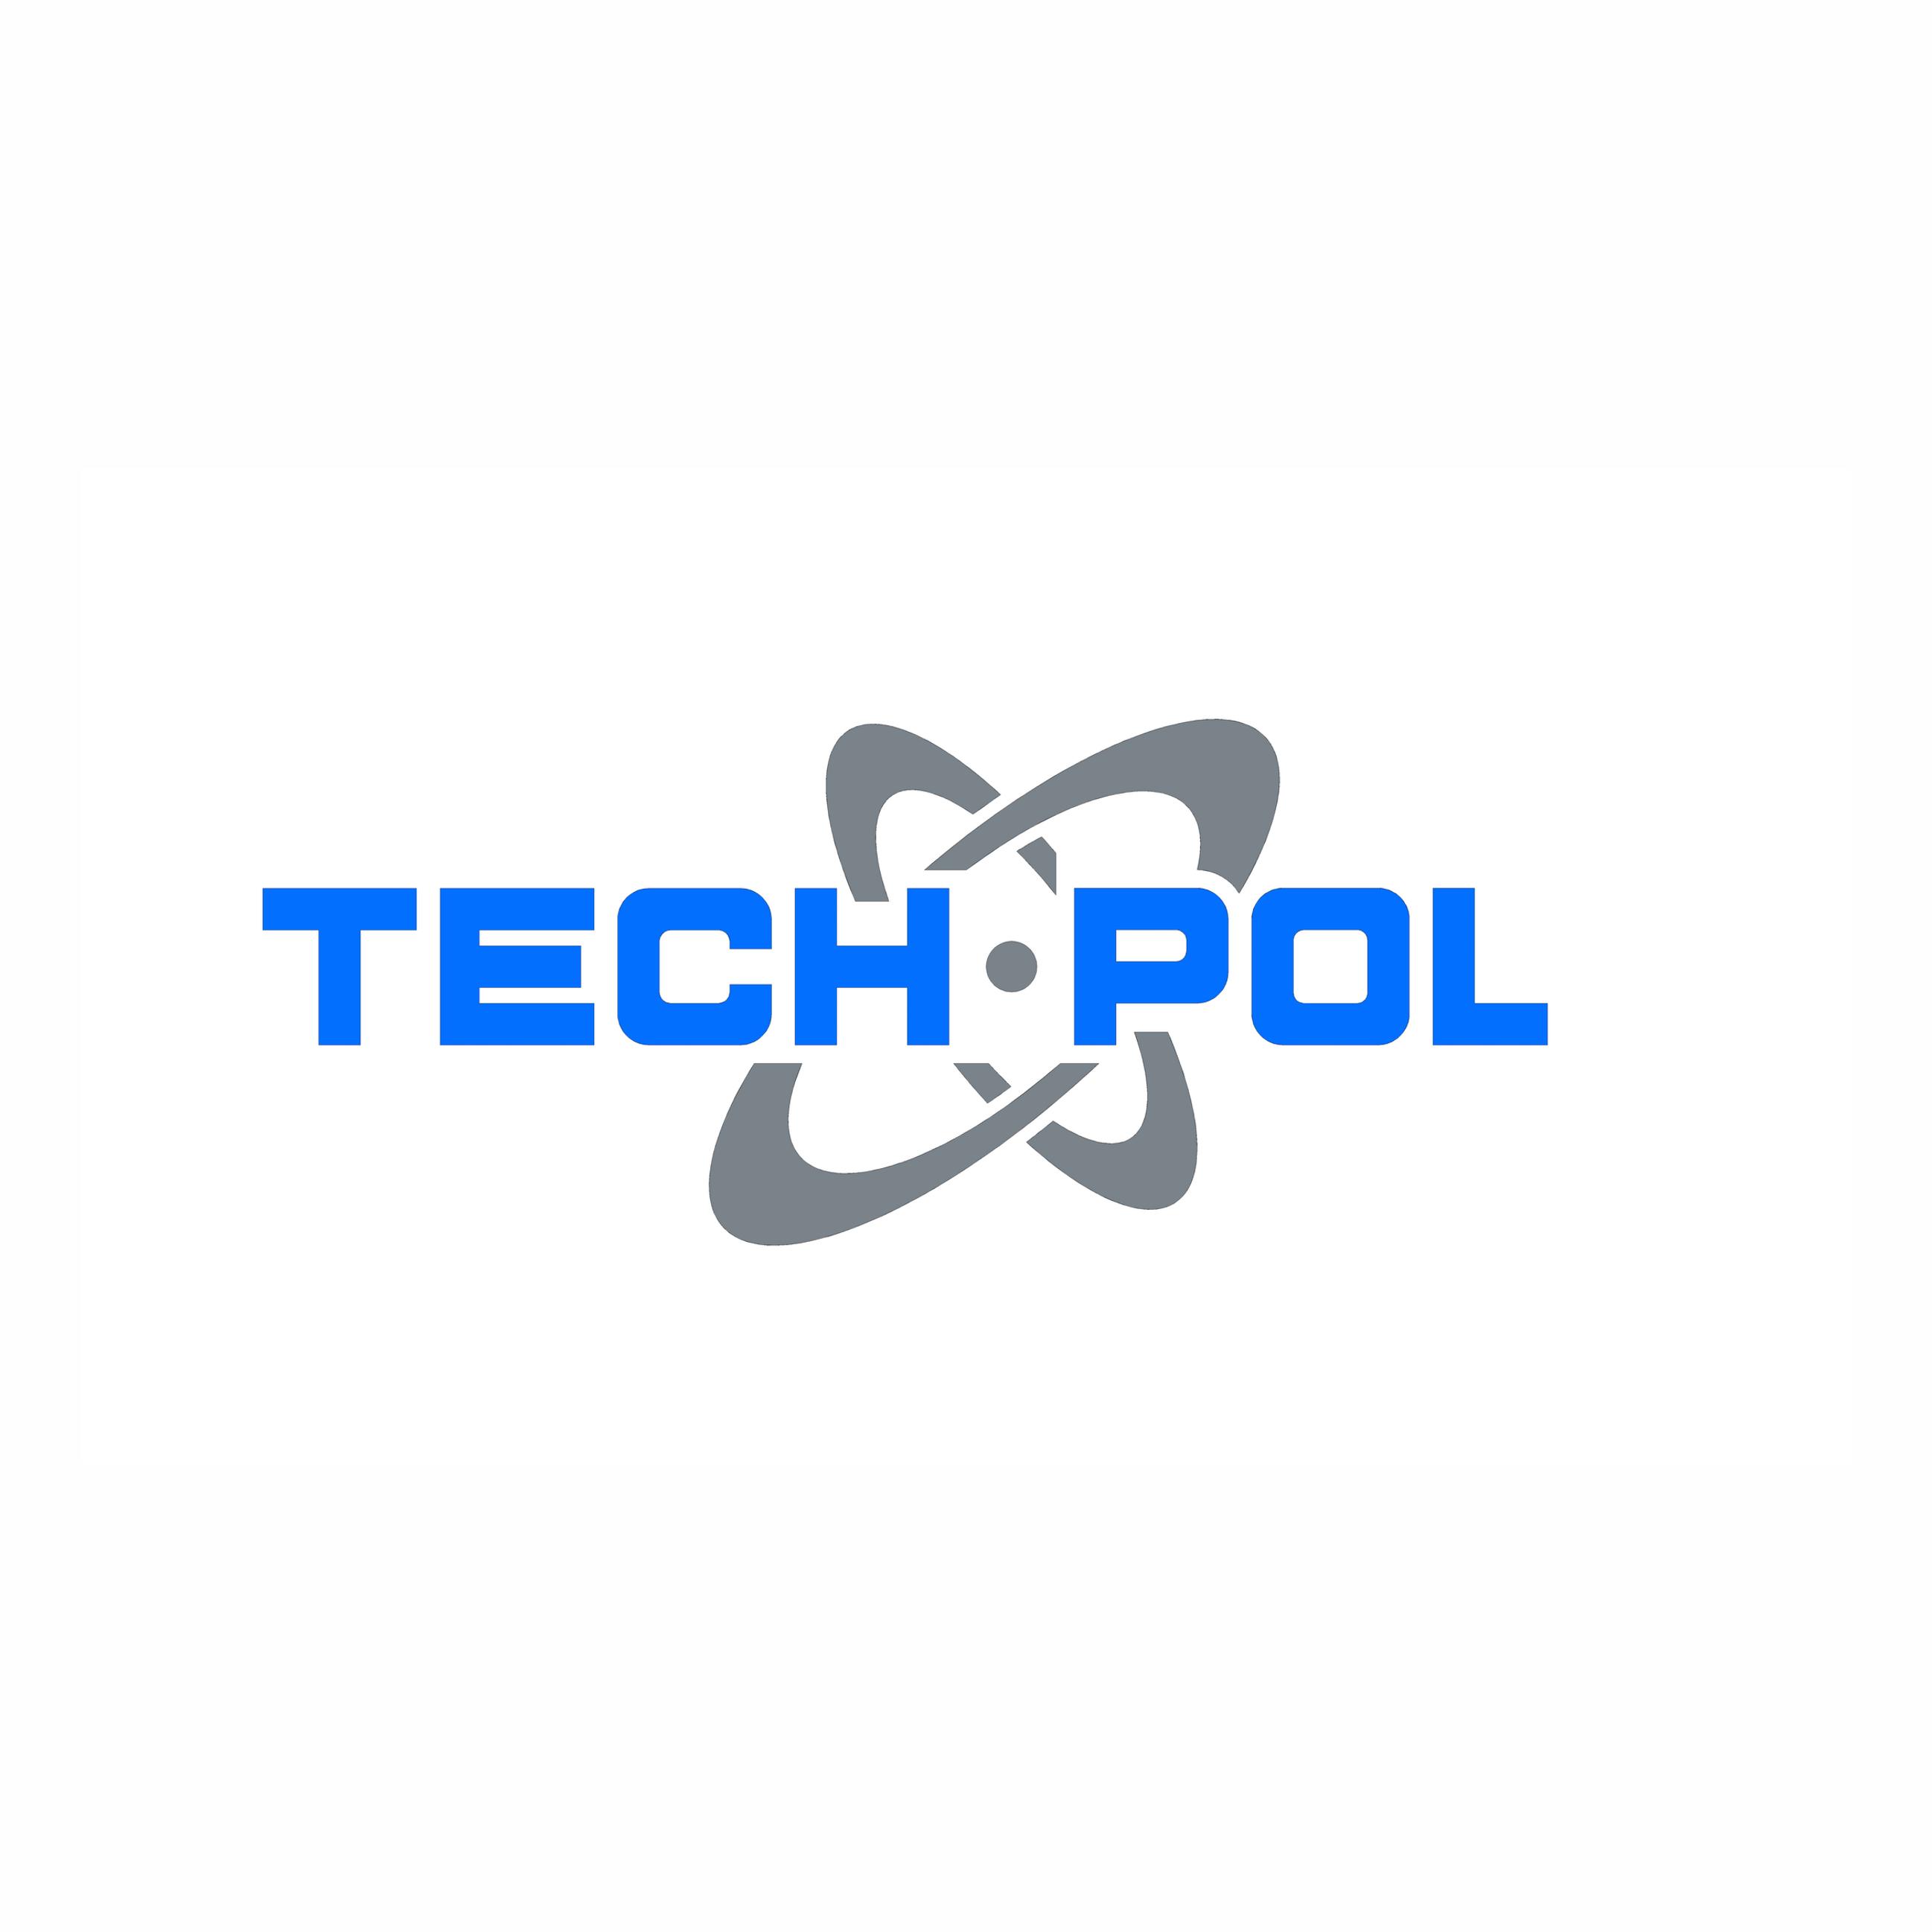 Logo Techpol Srl - Cliente Citynet Srl